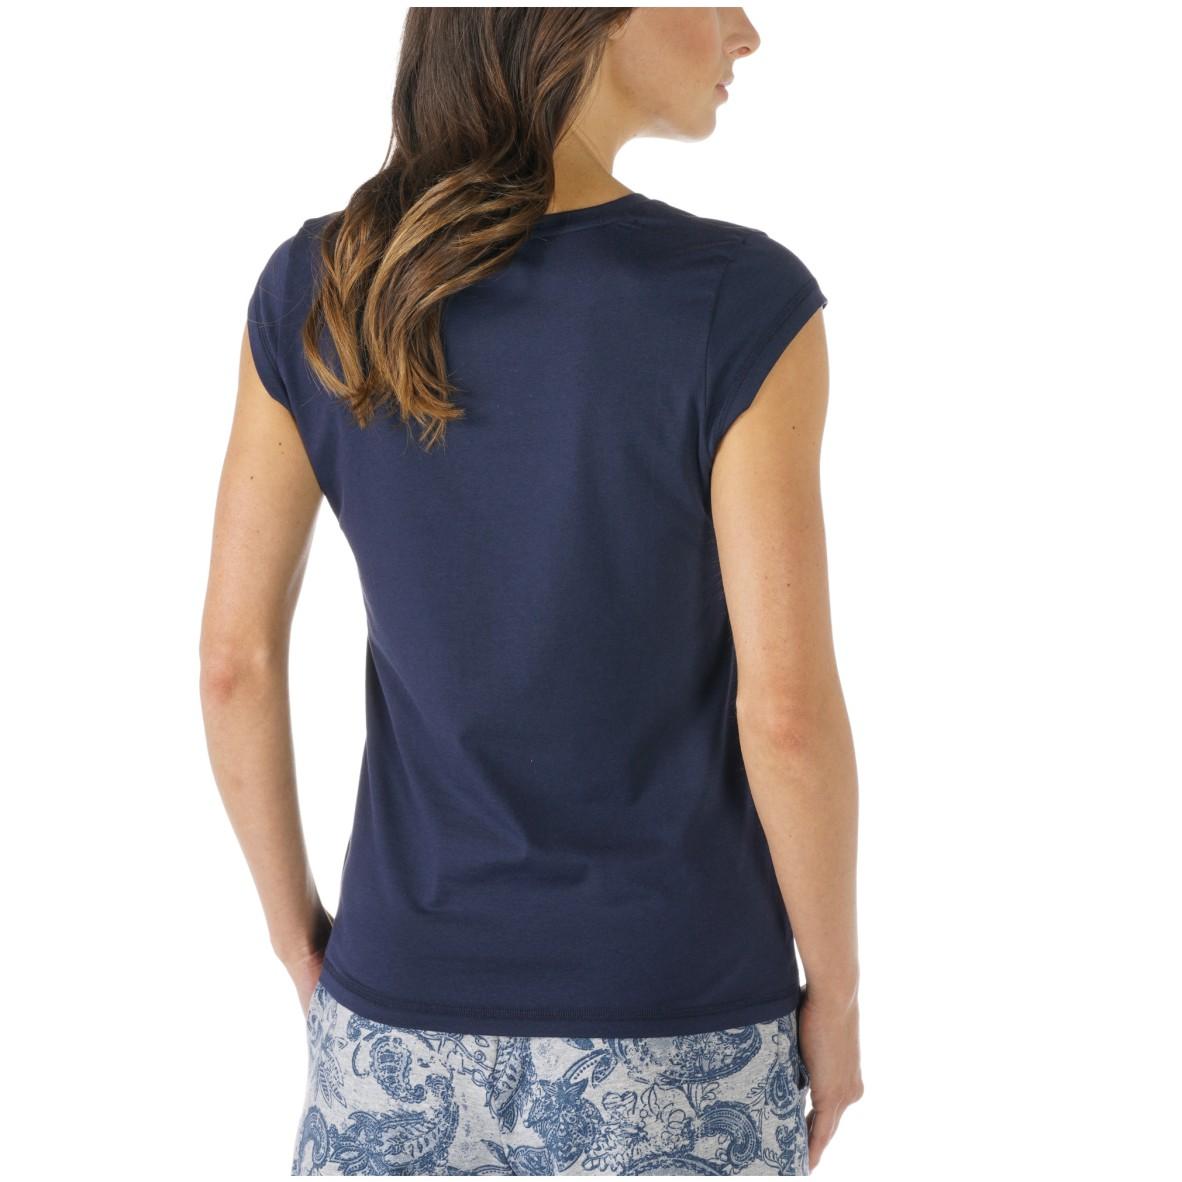 a88c658880b327 Mey Demi Damen Top ohne Arm - Siemers Online-Shop